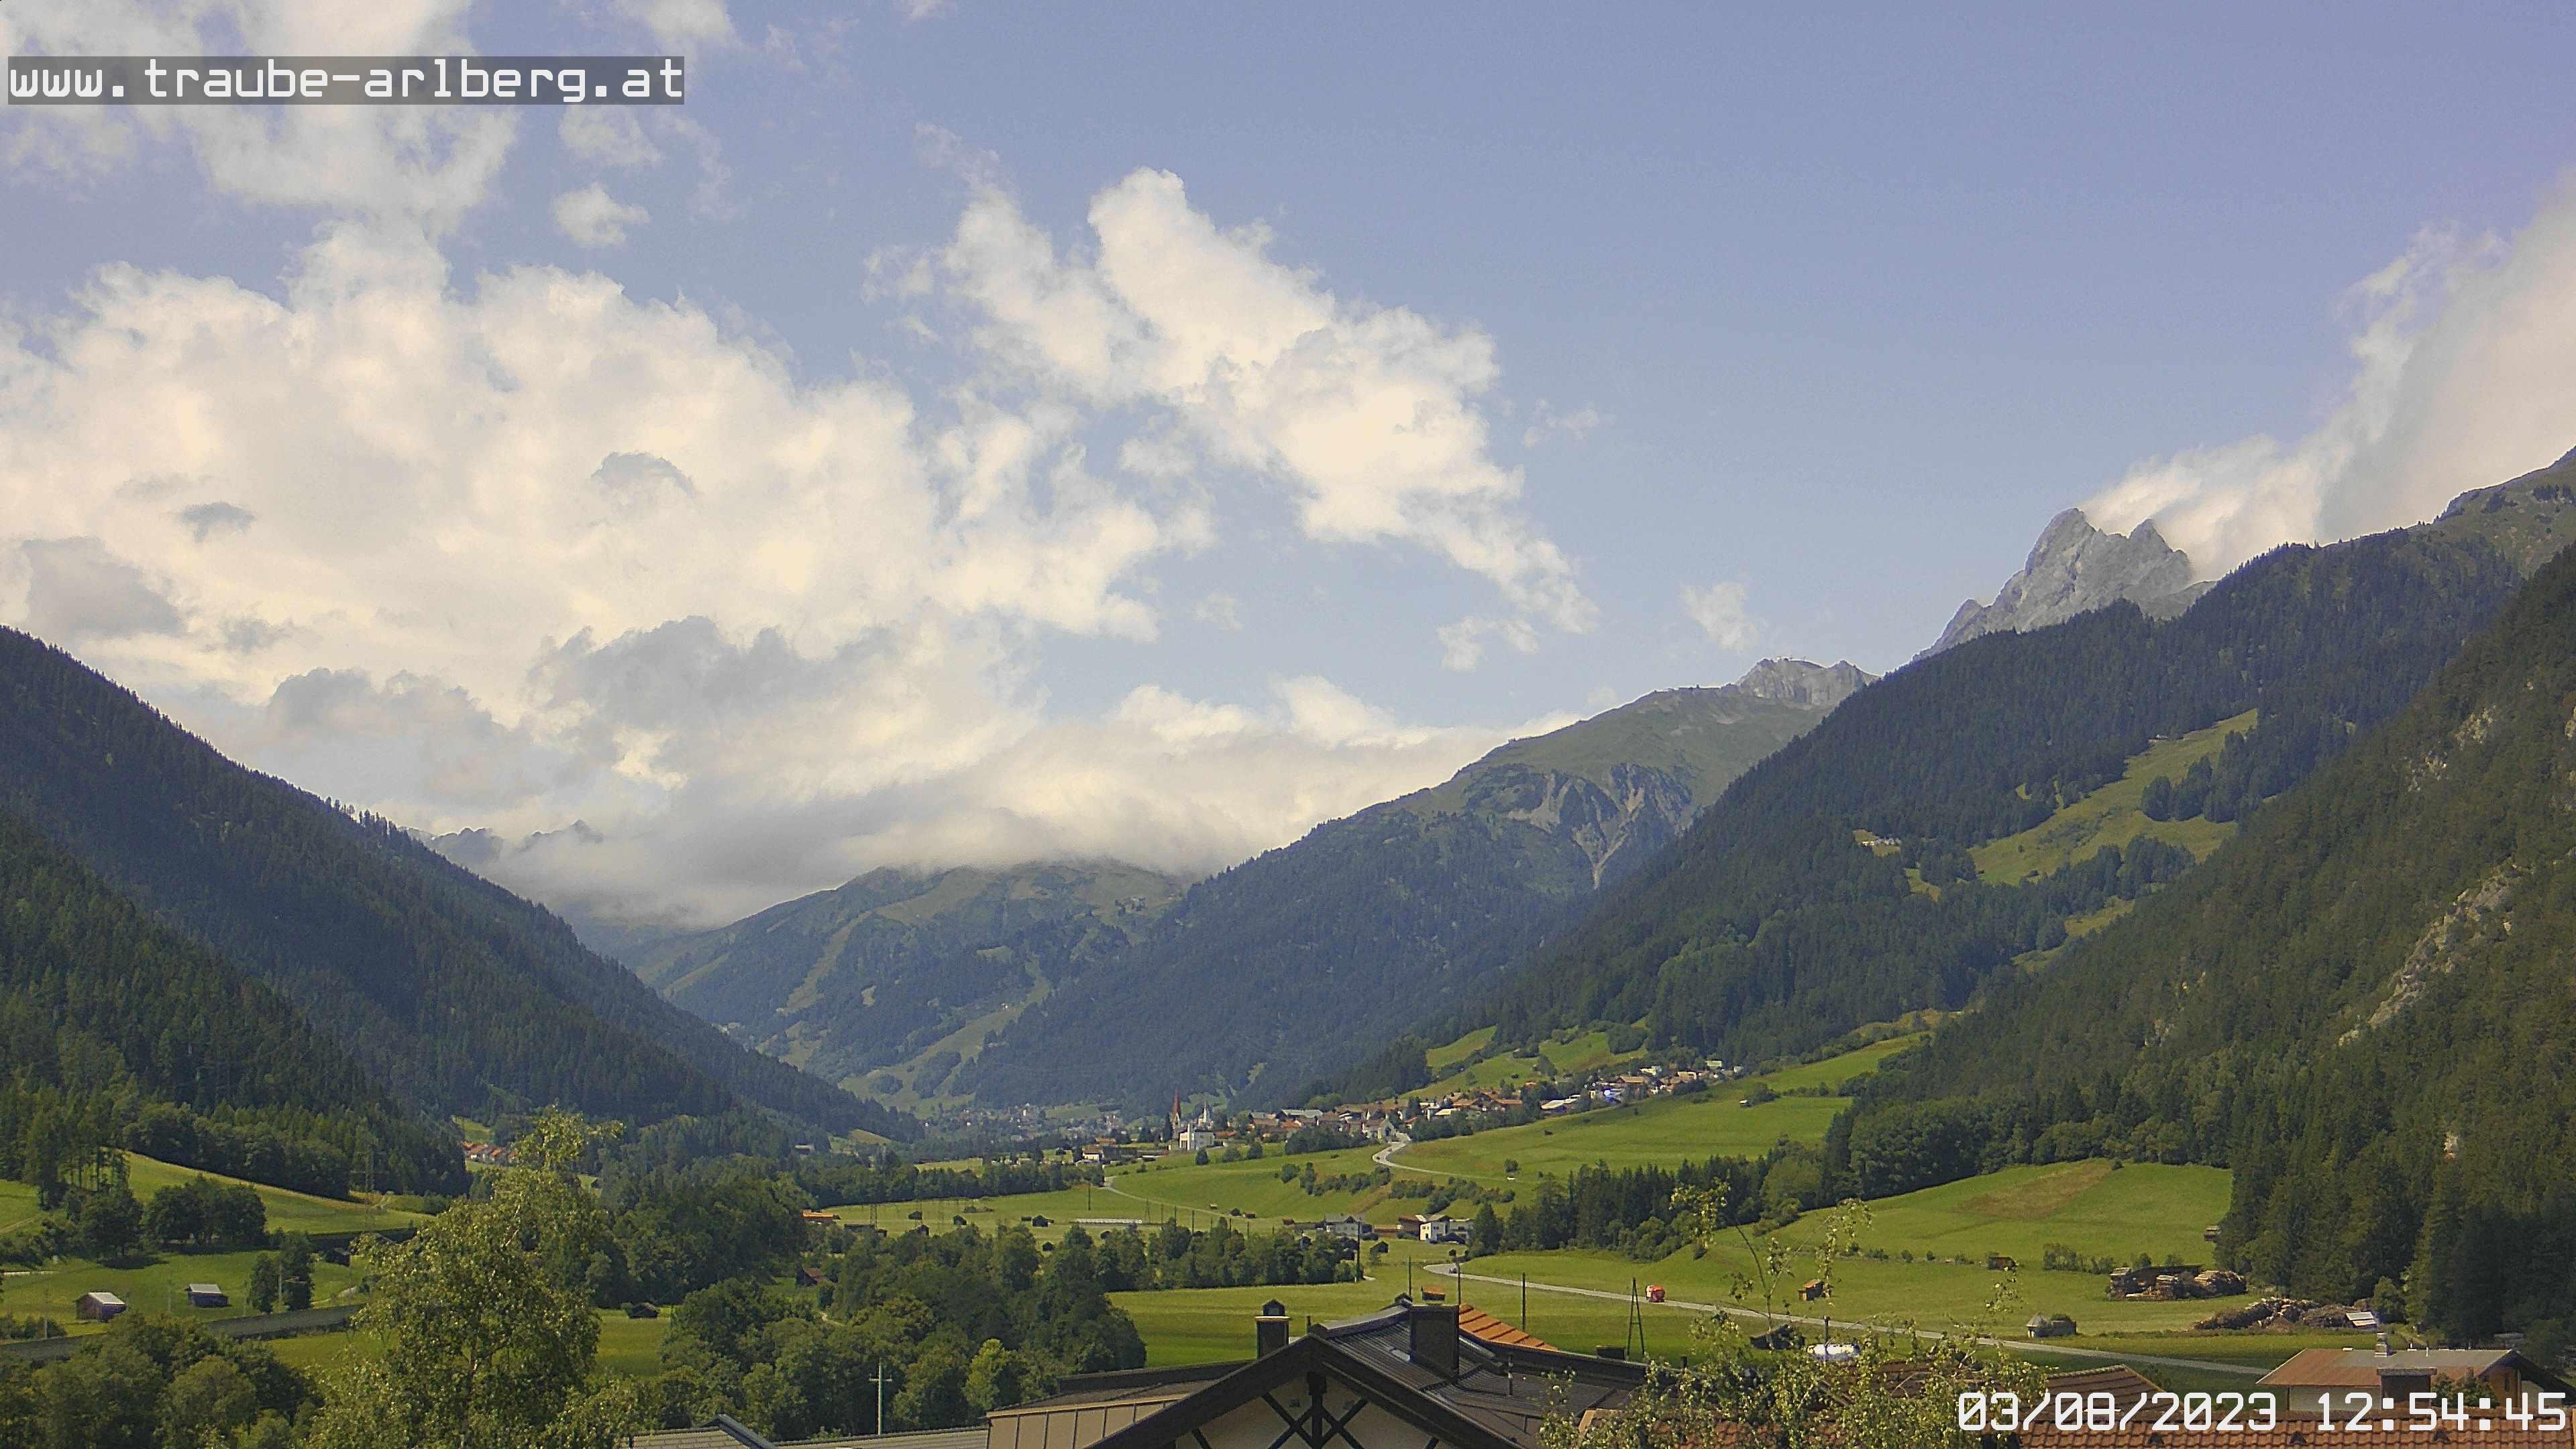 Webcams de St. Anton am Arlberg (Austria)